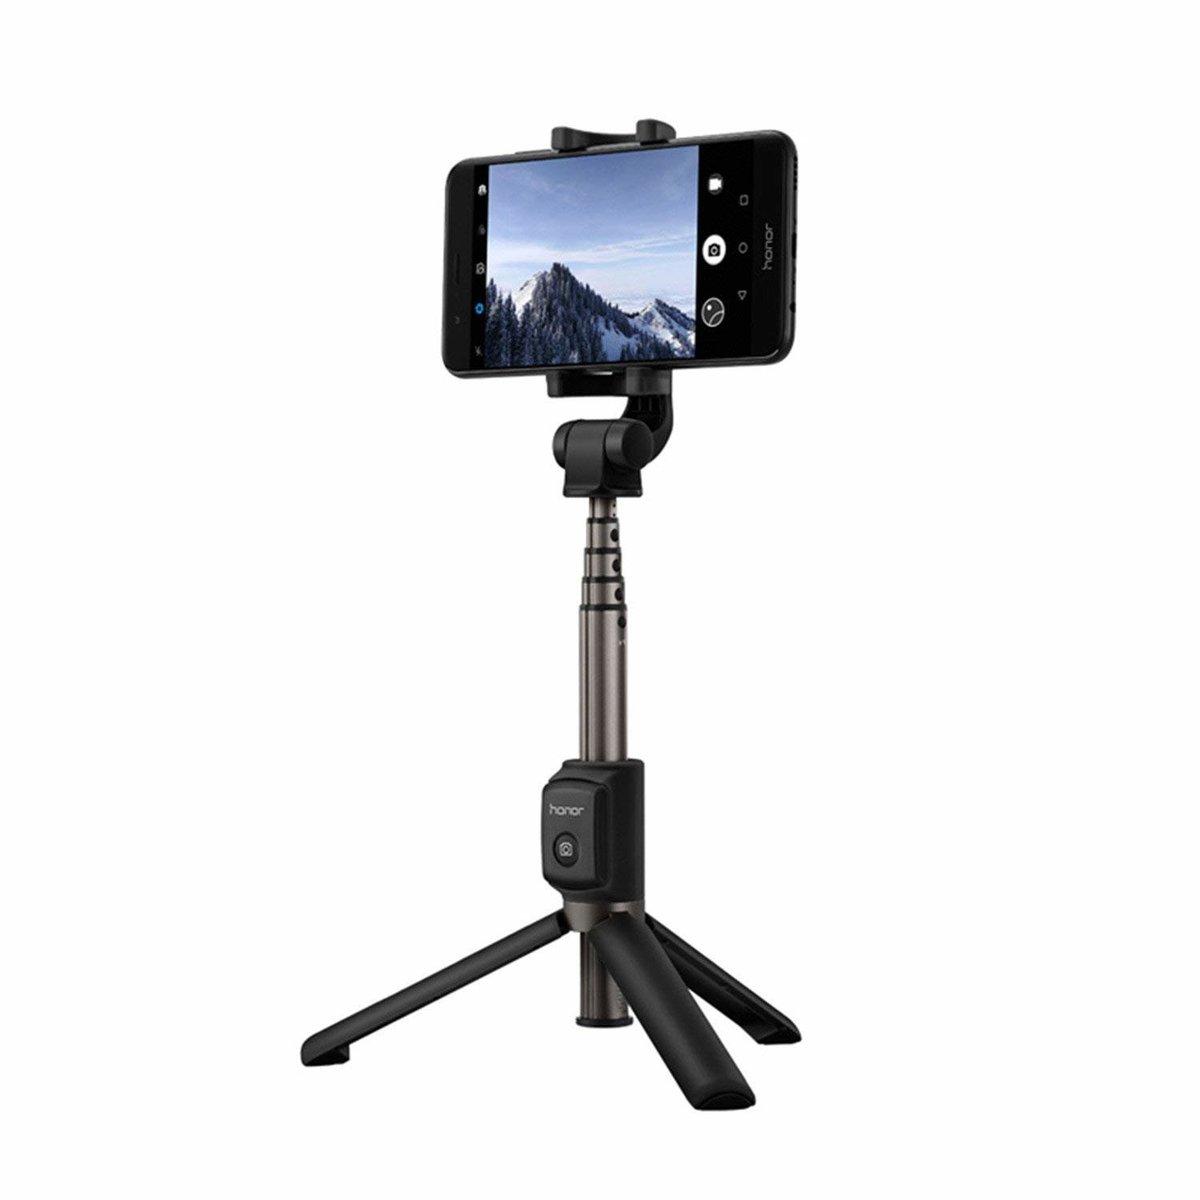 Huawei / Honor AF15 Bluetooth Selfie Stick Tripod (Black)